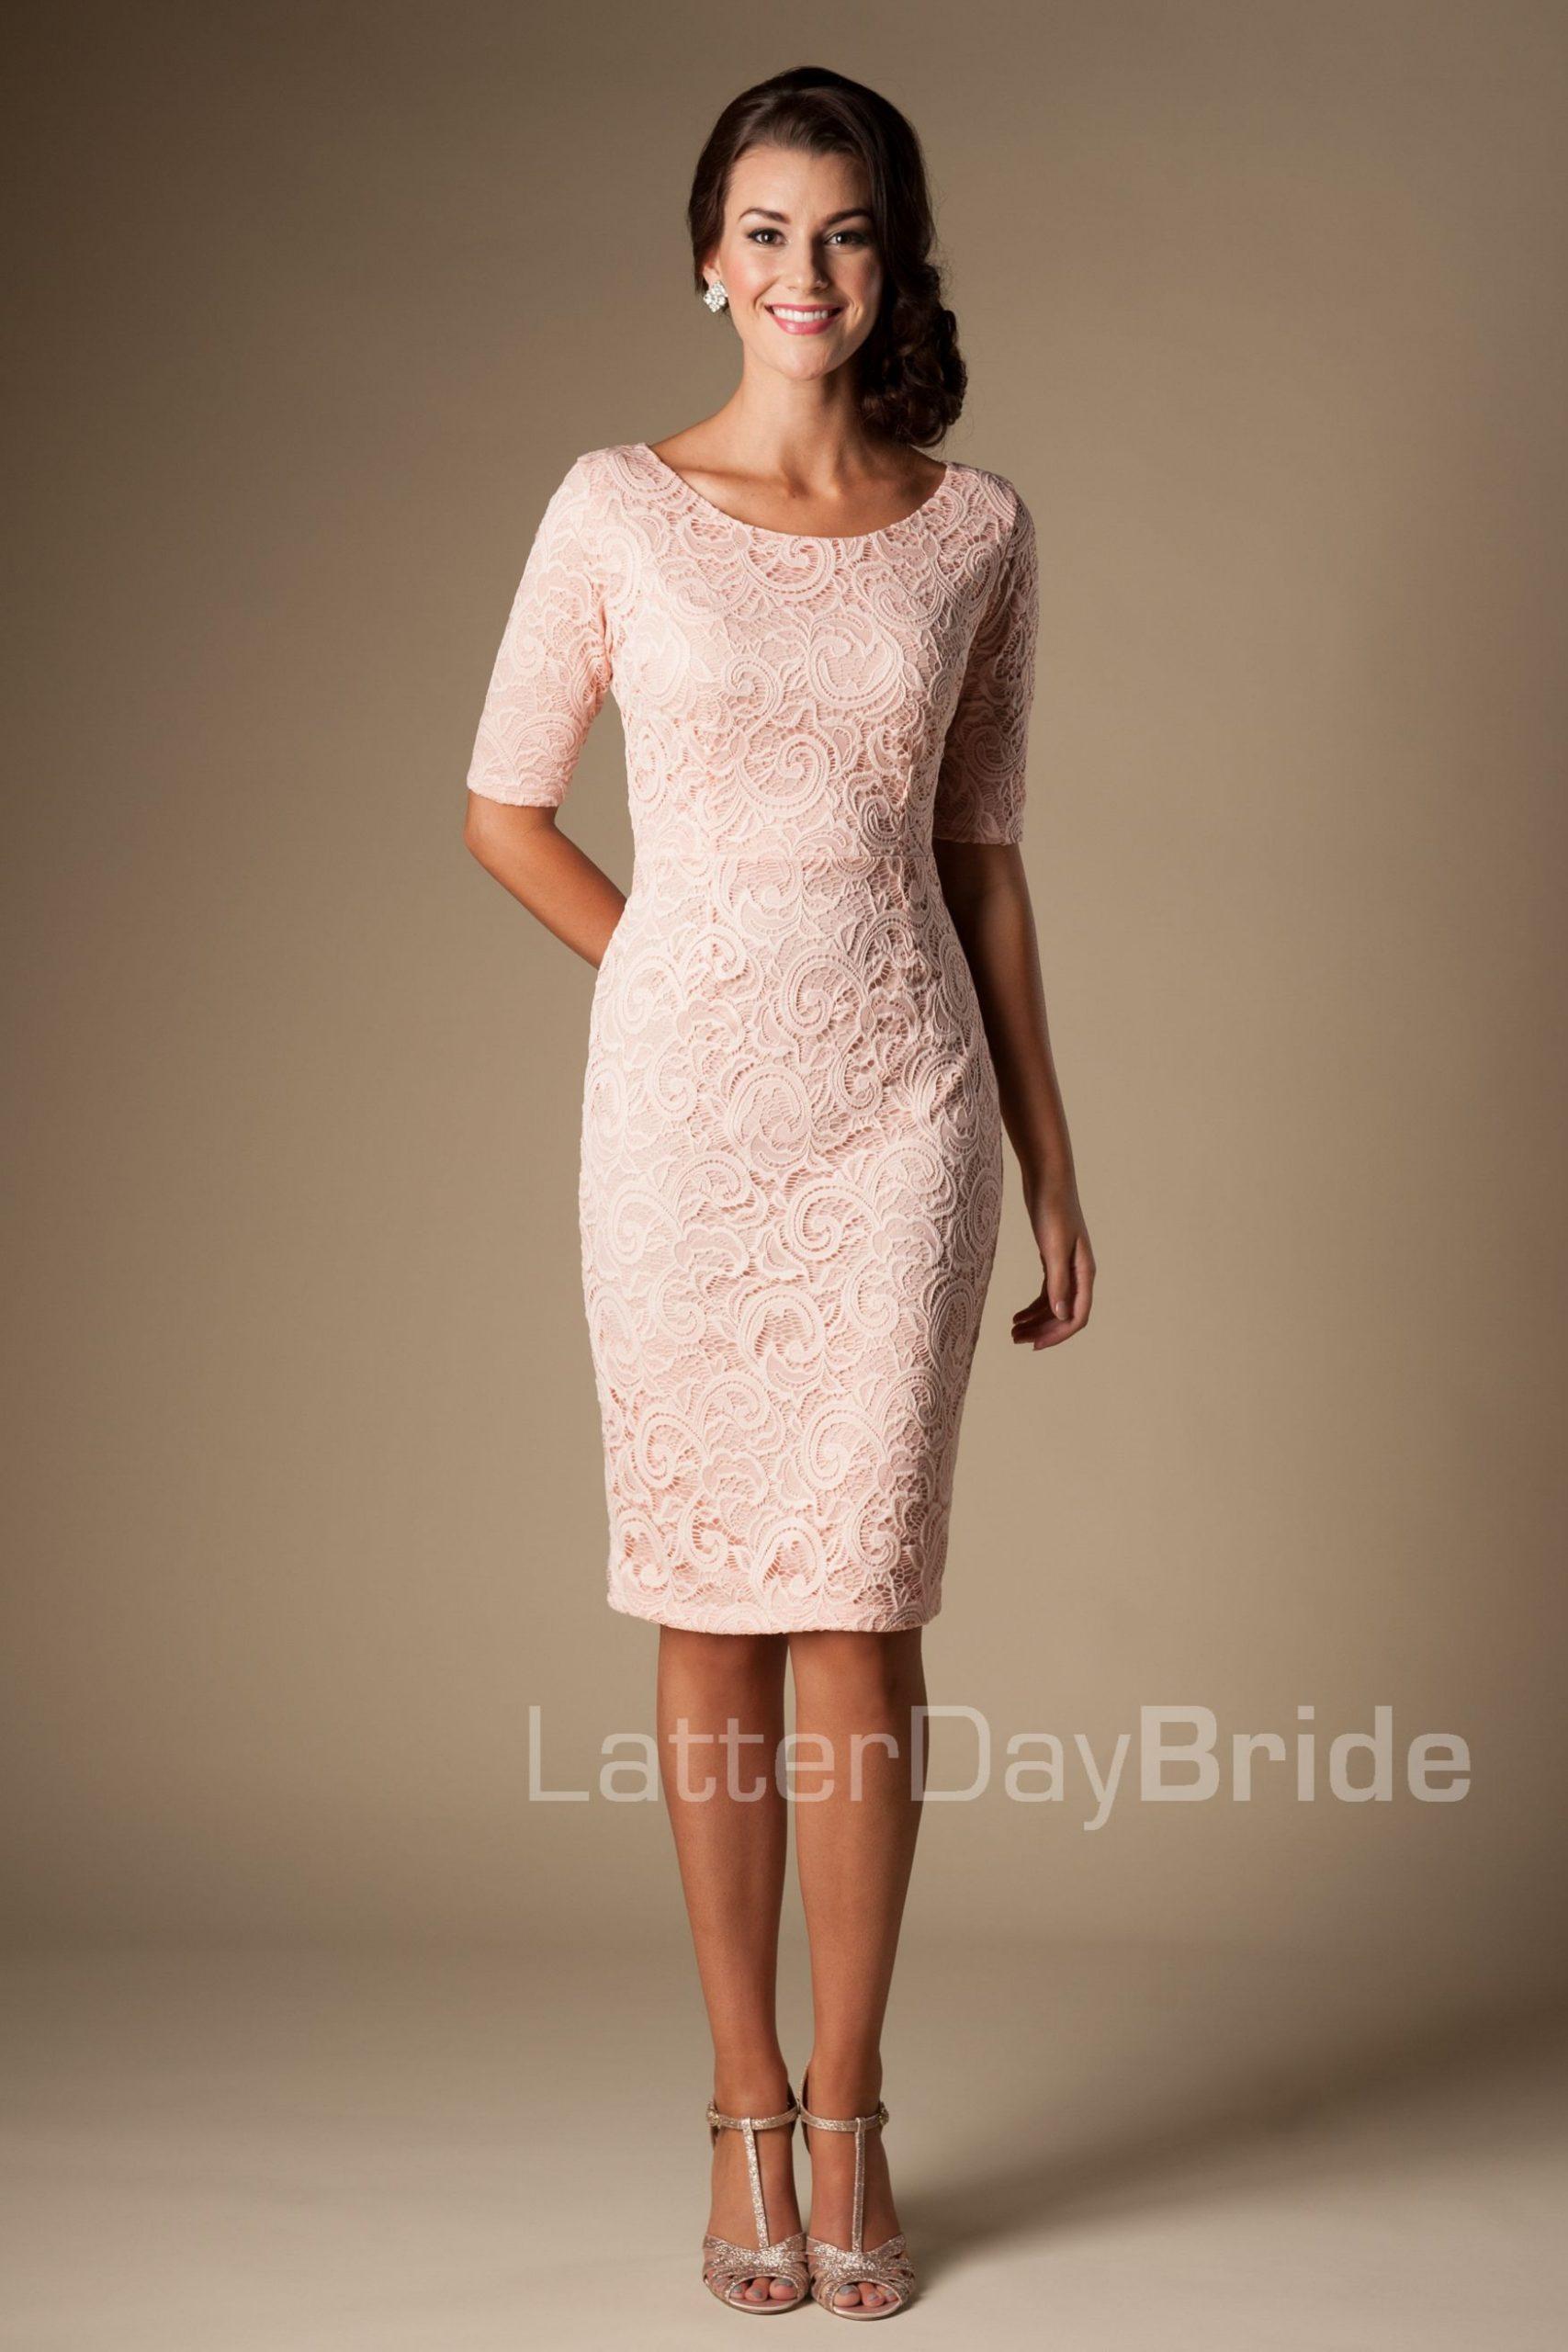 Modest Bridesmaid Dresses : Mw22874 Cocktail Dress Option